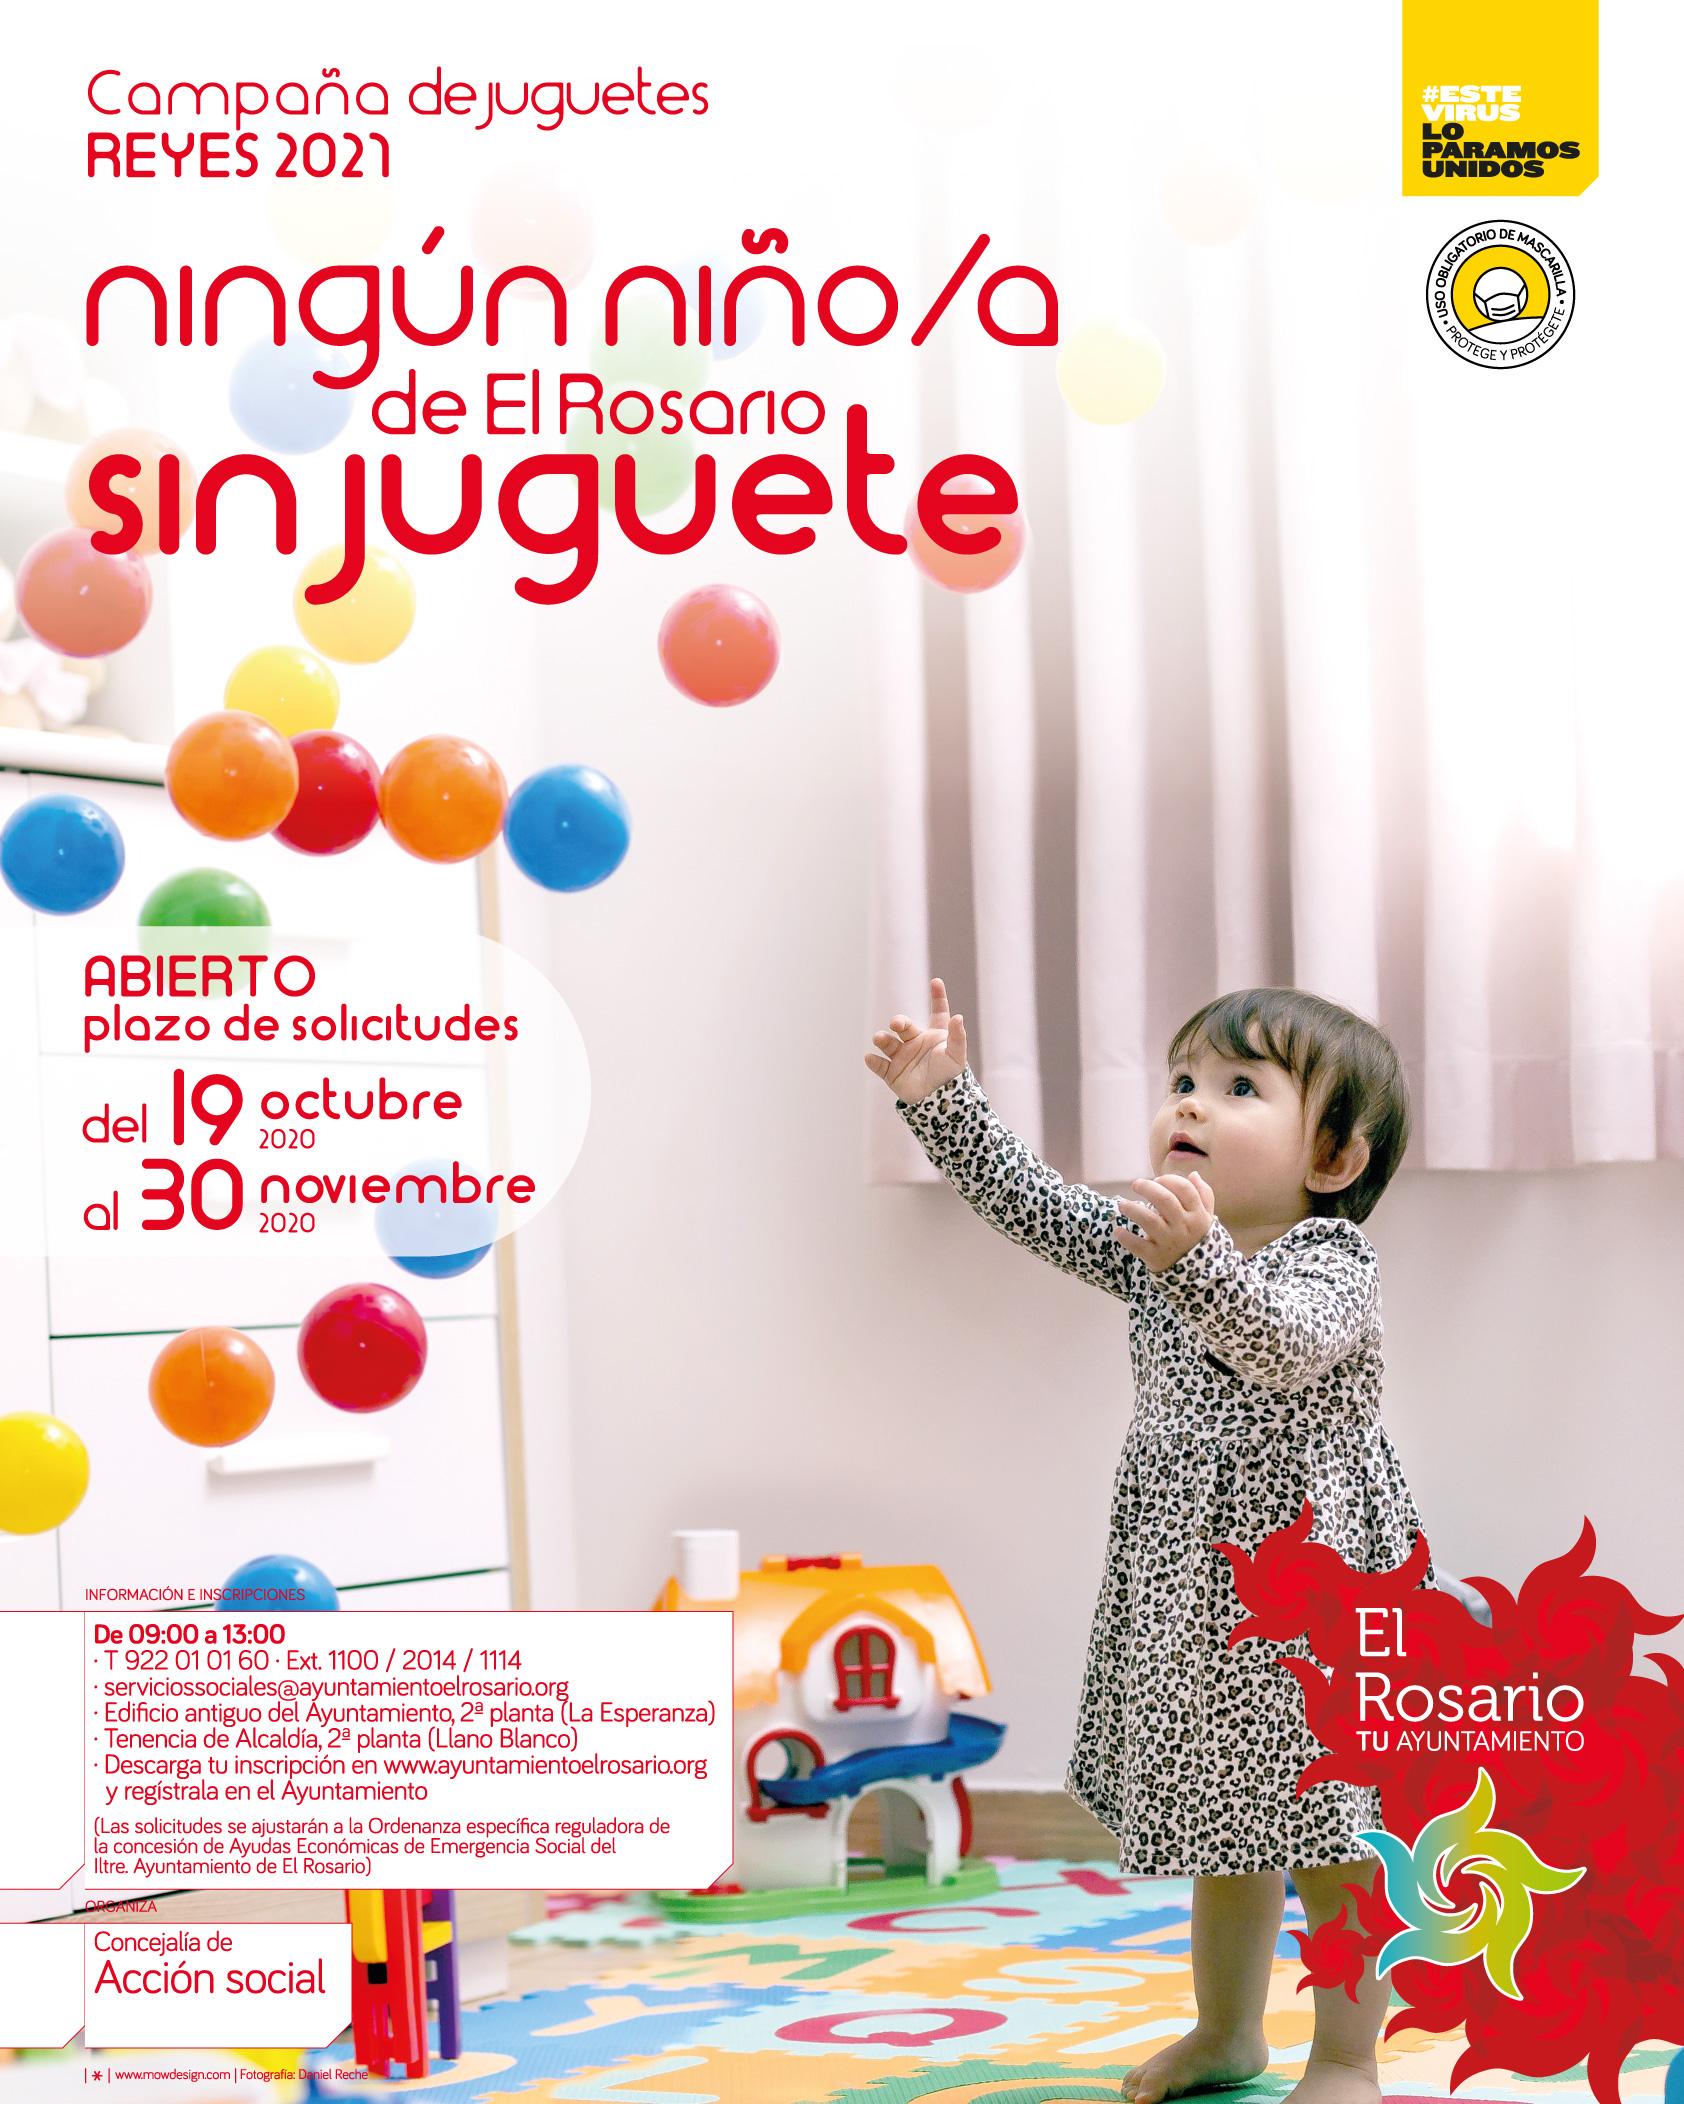 NINGUN_A-NINIO_A-SIN_JUGUETE-20201006-CARTEL_A3-20201015-01af-redes